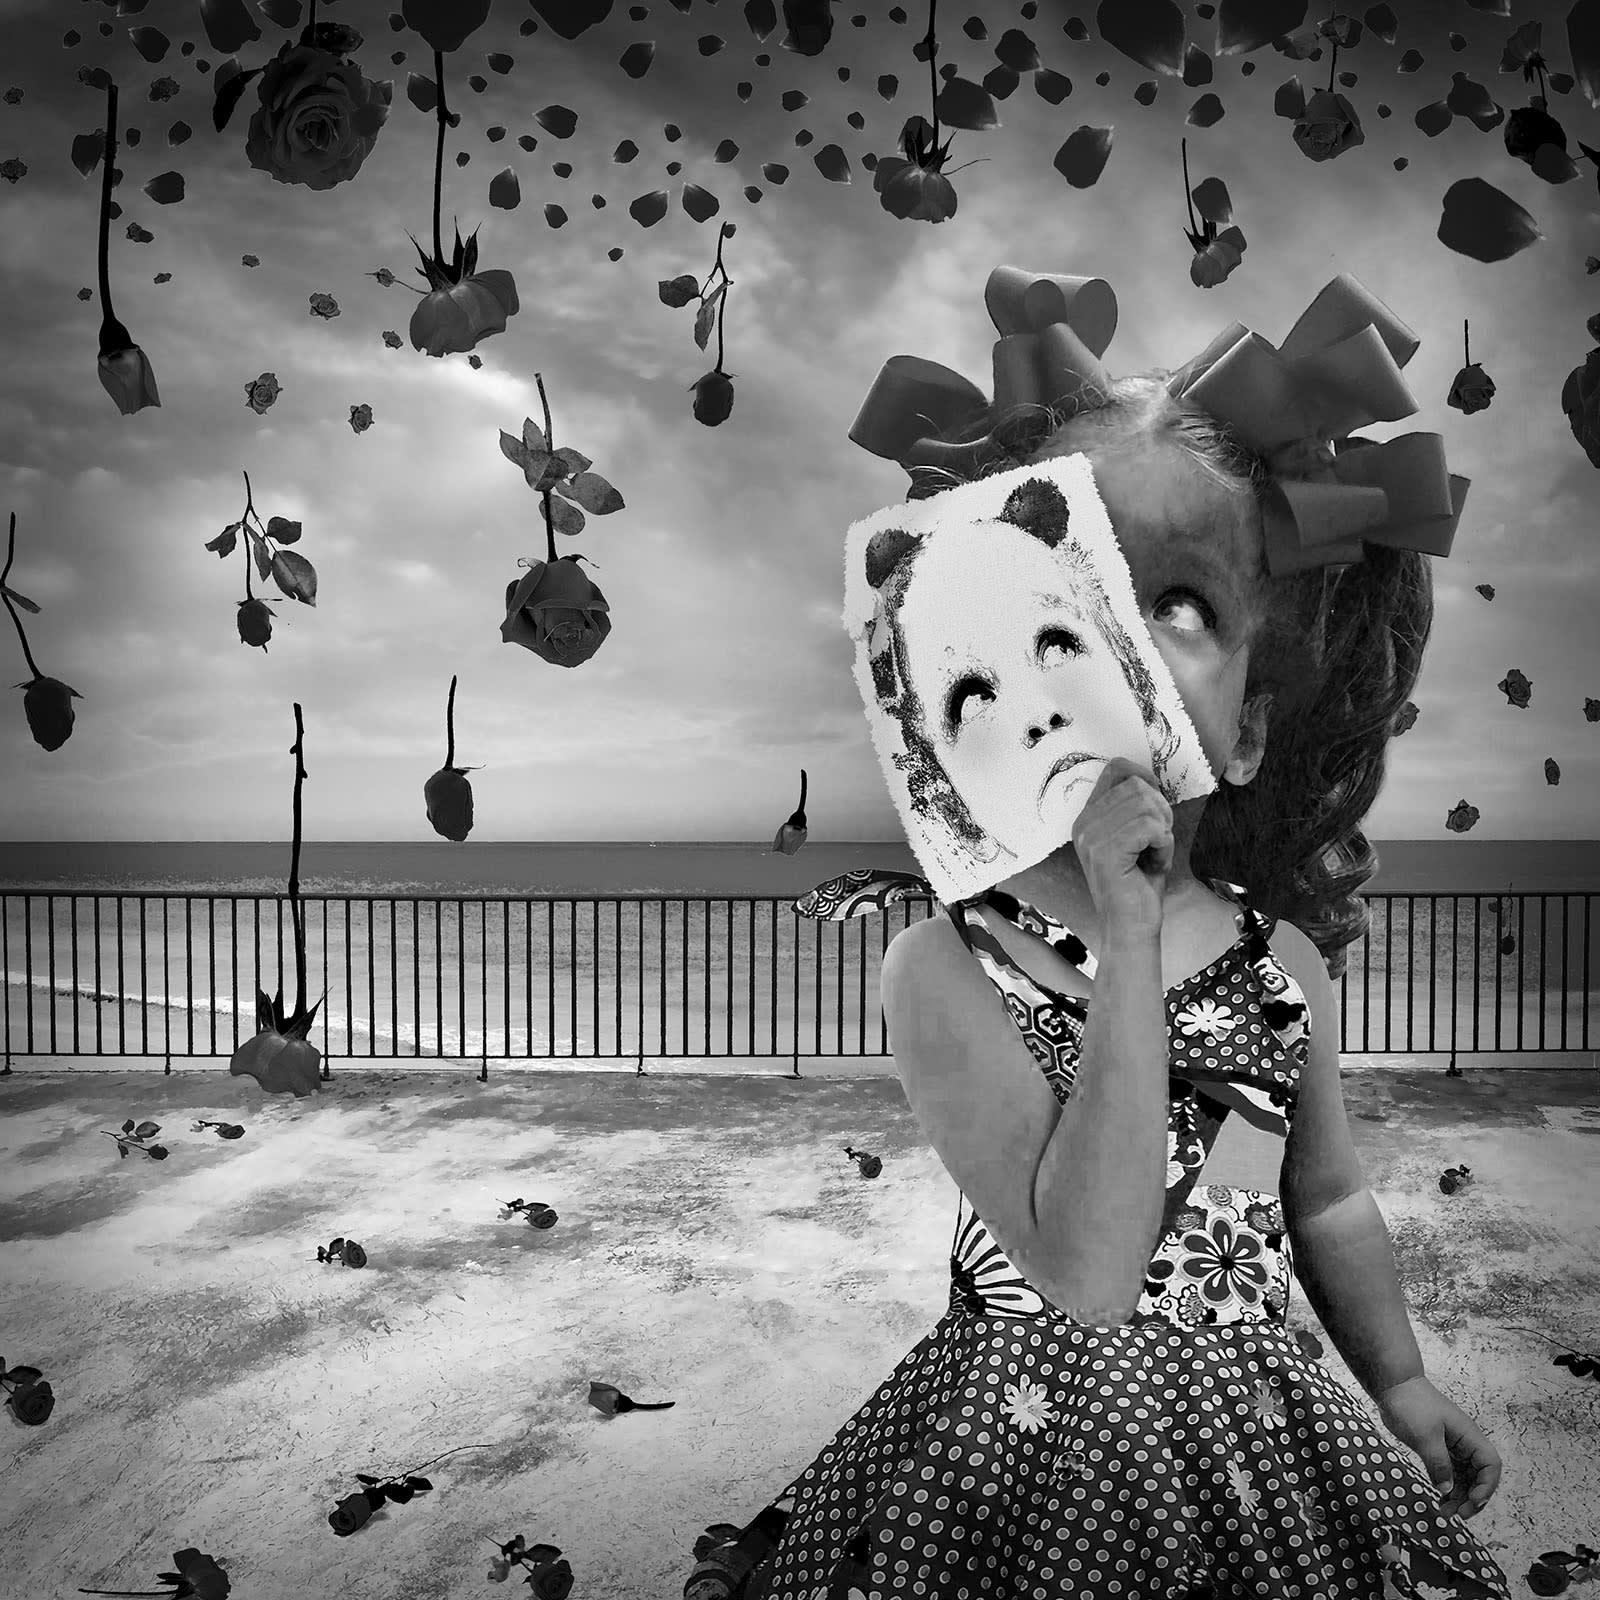 Alain Lacki, Les fleurs du mal, 2014